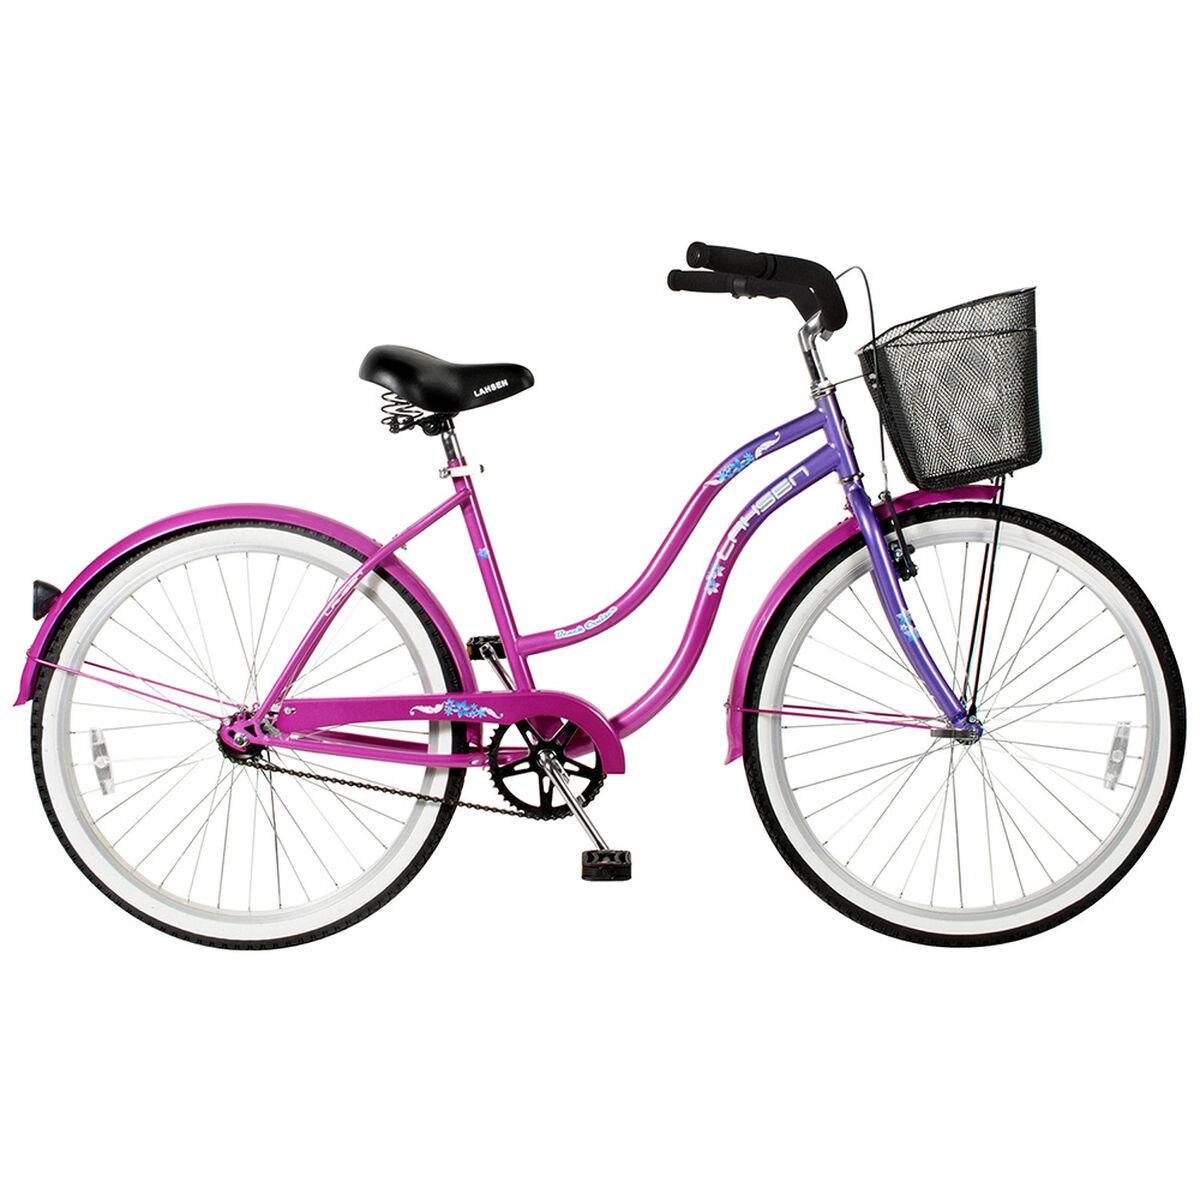 Bicicleta Lahsen Beach Cruiser Aro 26